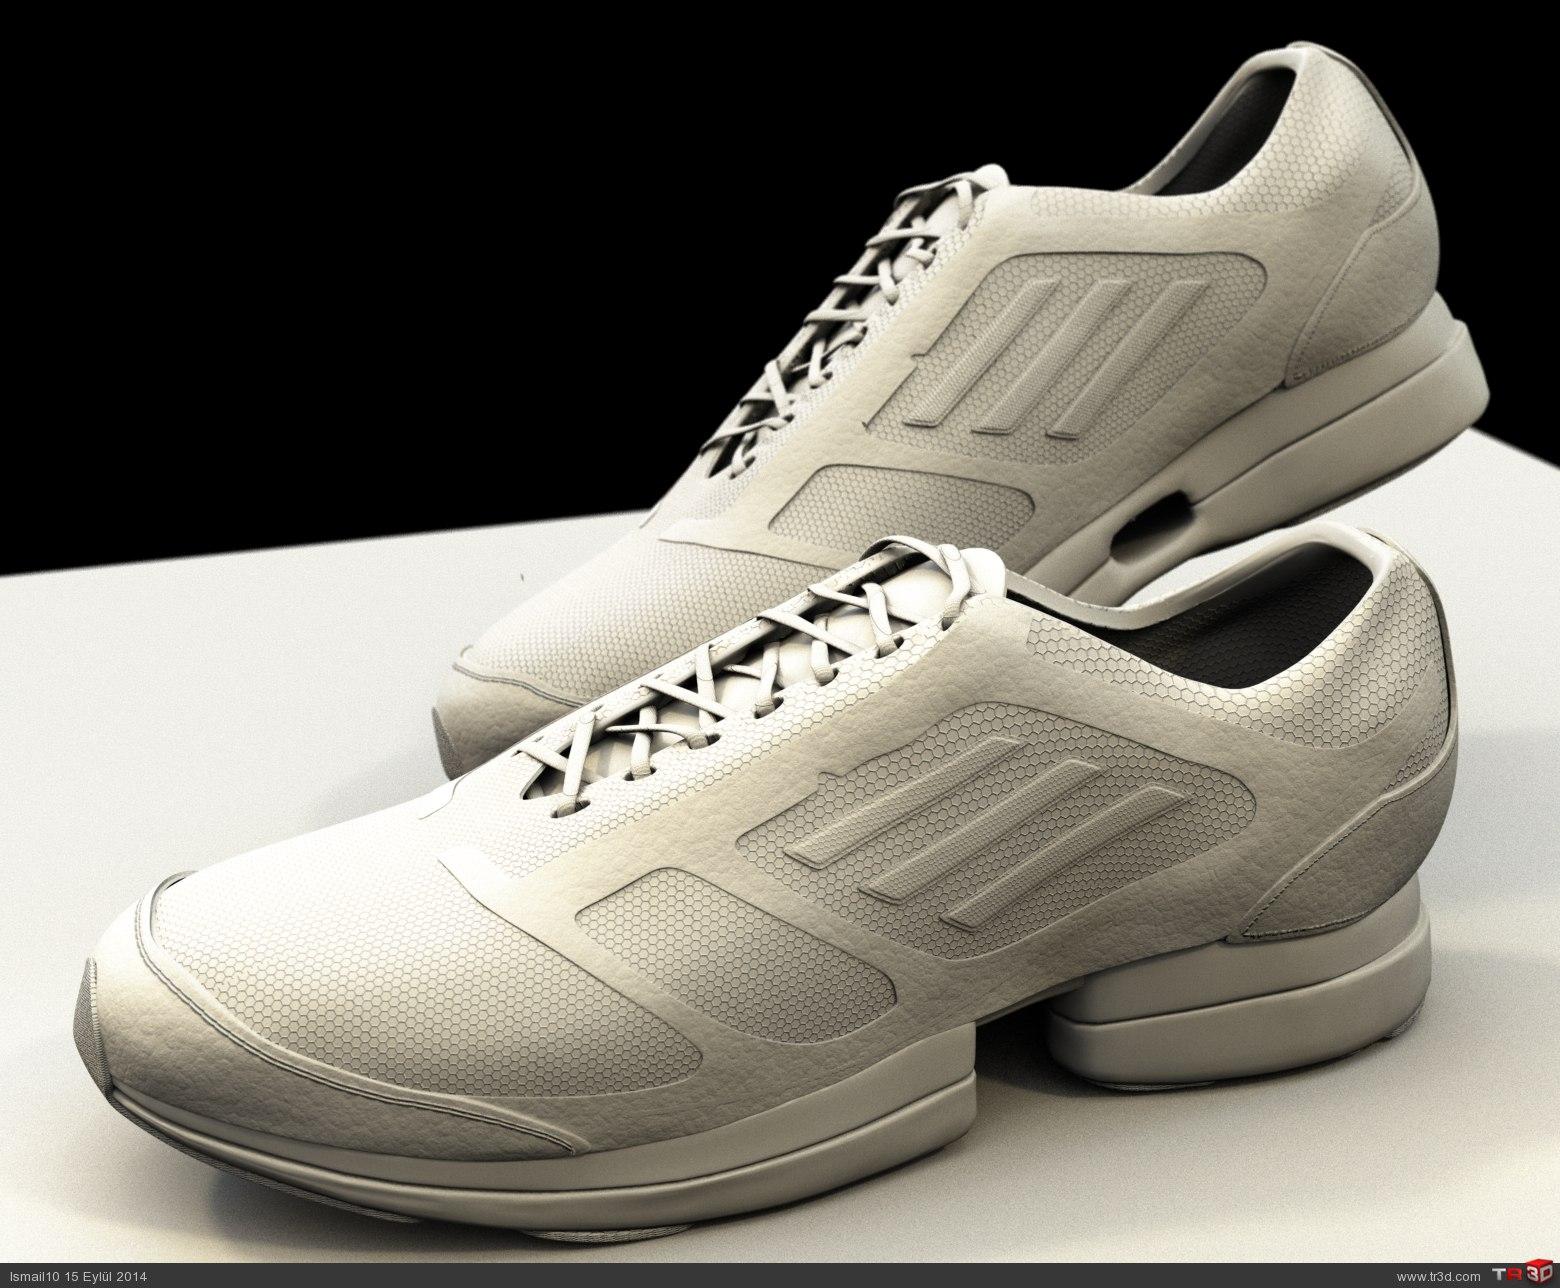 Adidas - adizero feather 1